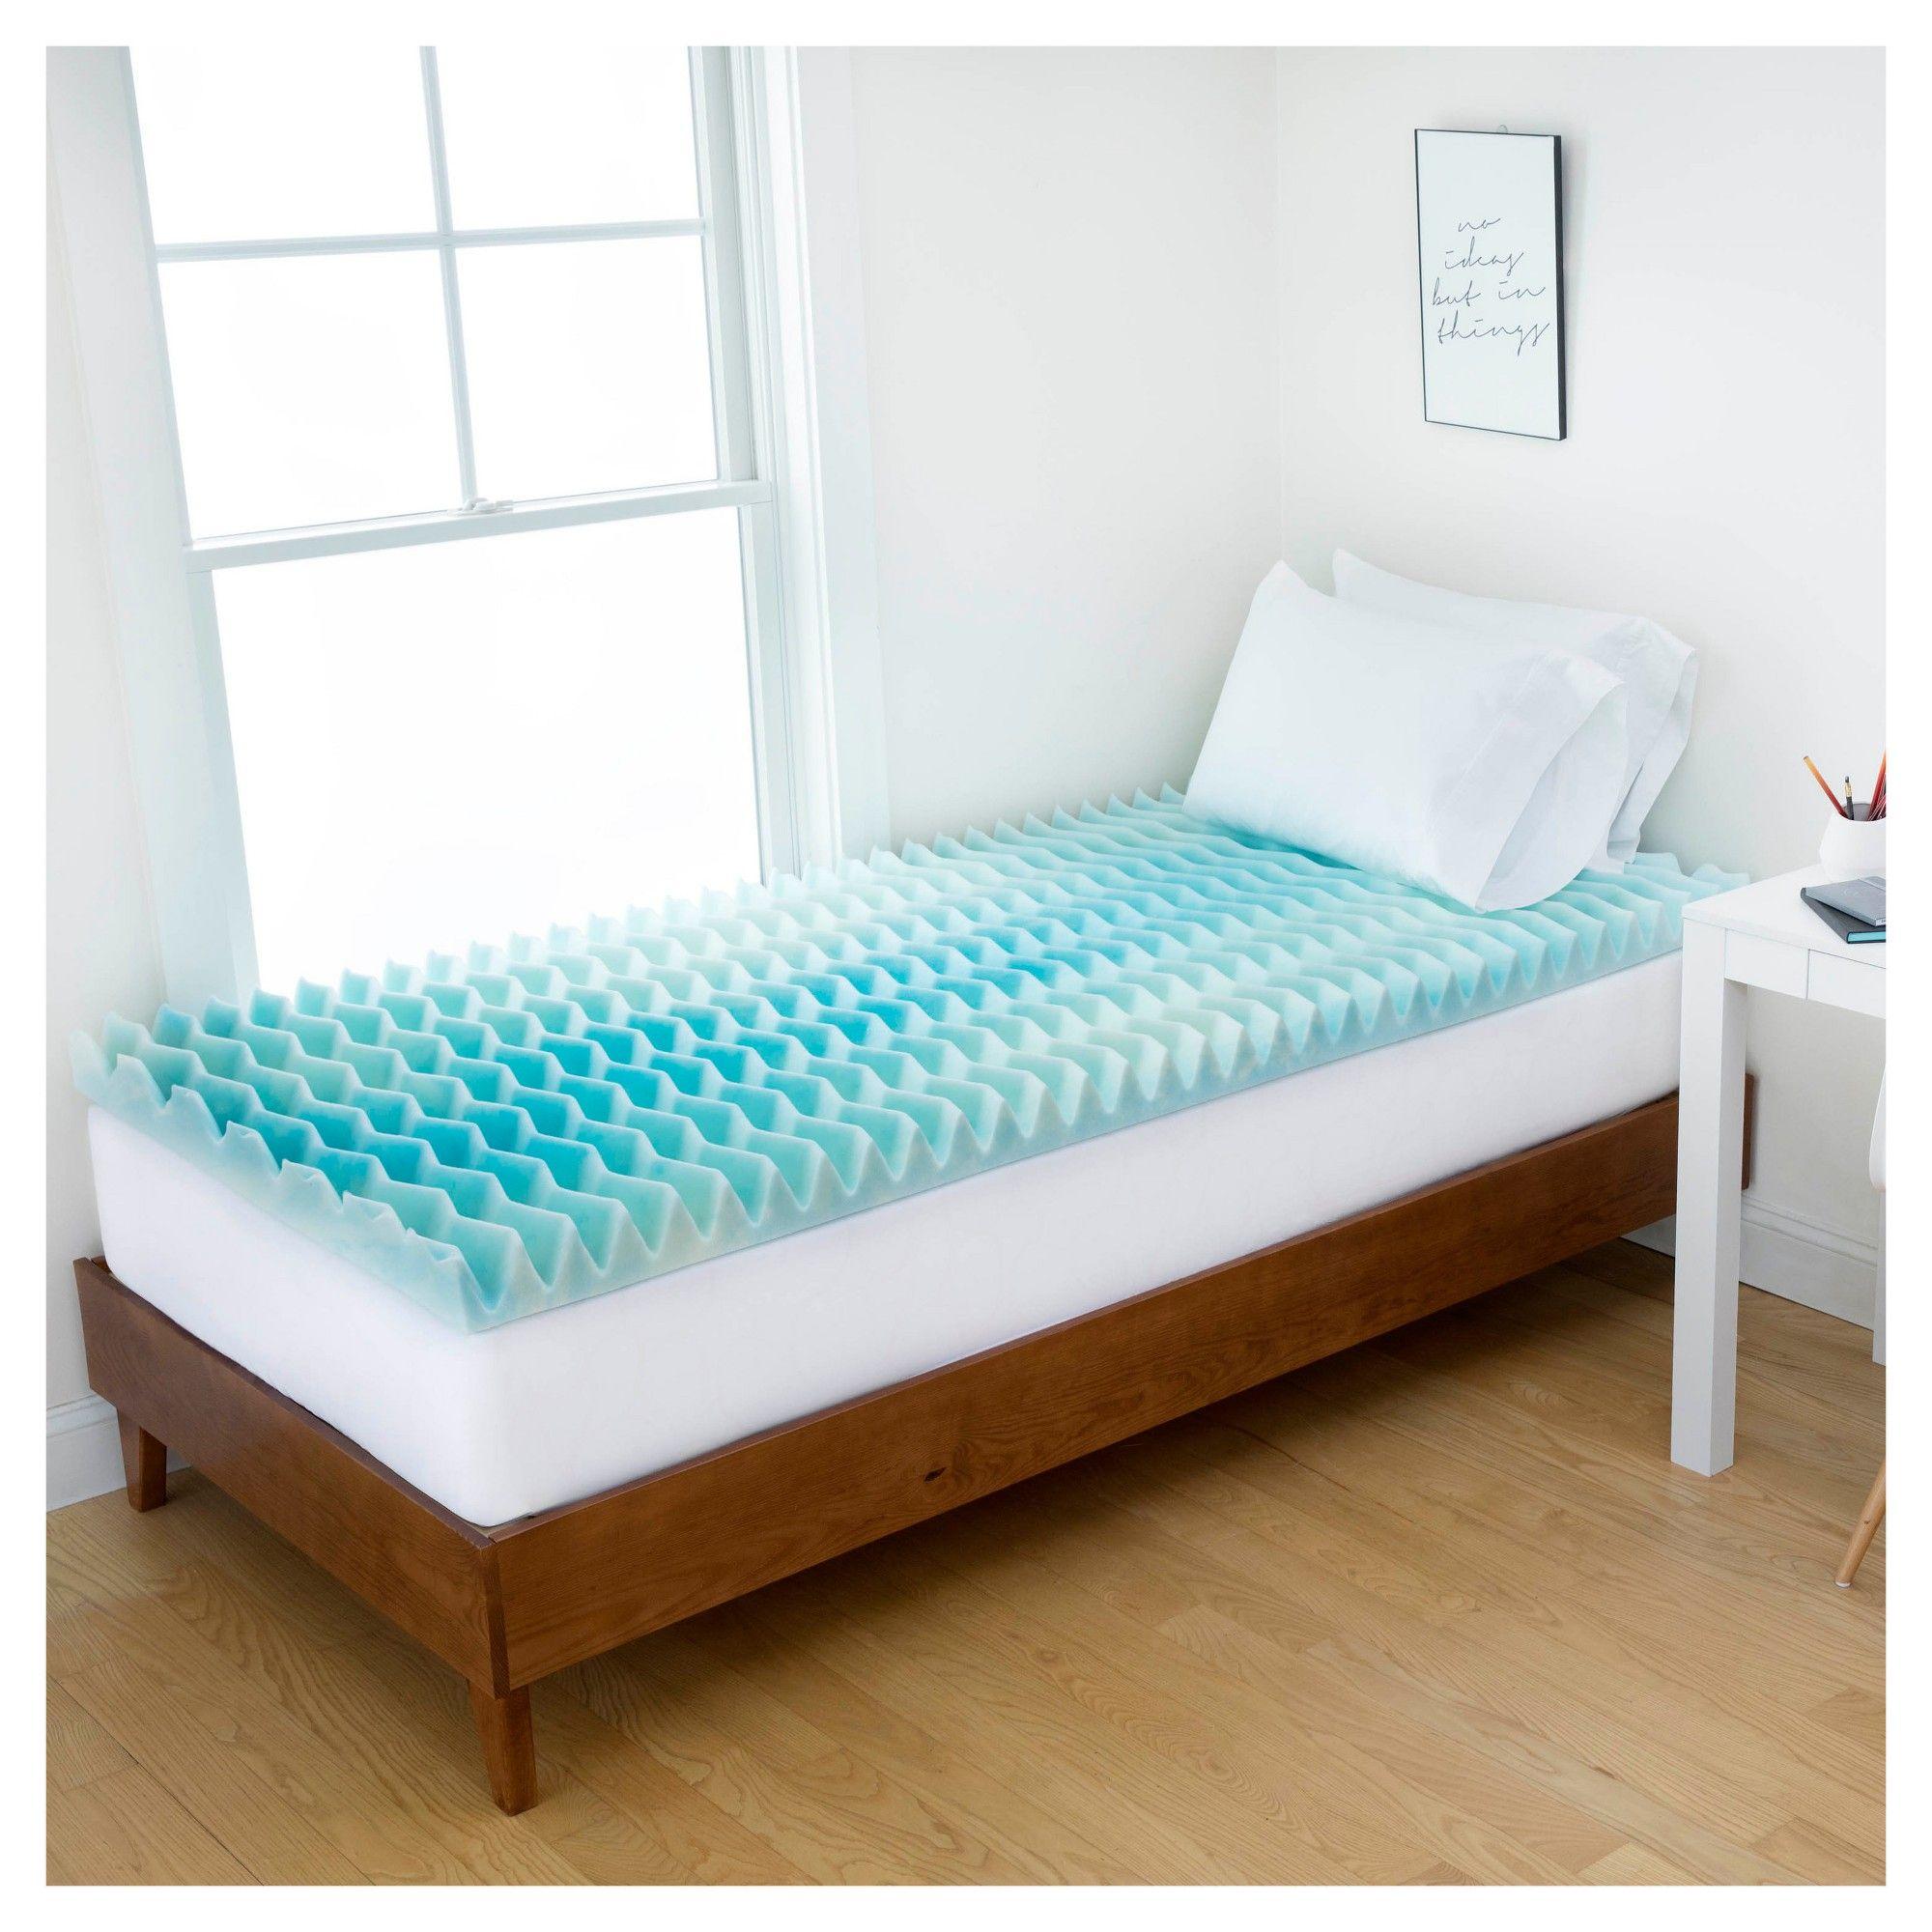 1 5 Blue Wave Memory Foam Dorm Mattress Topper Twin Extra Long